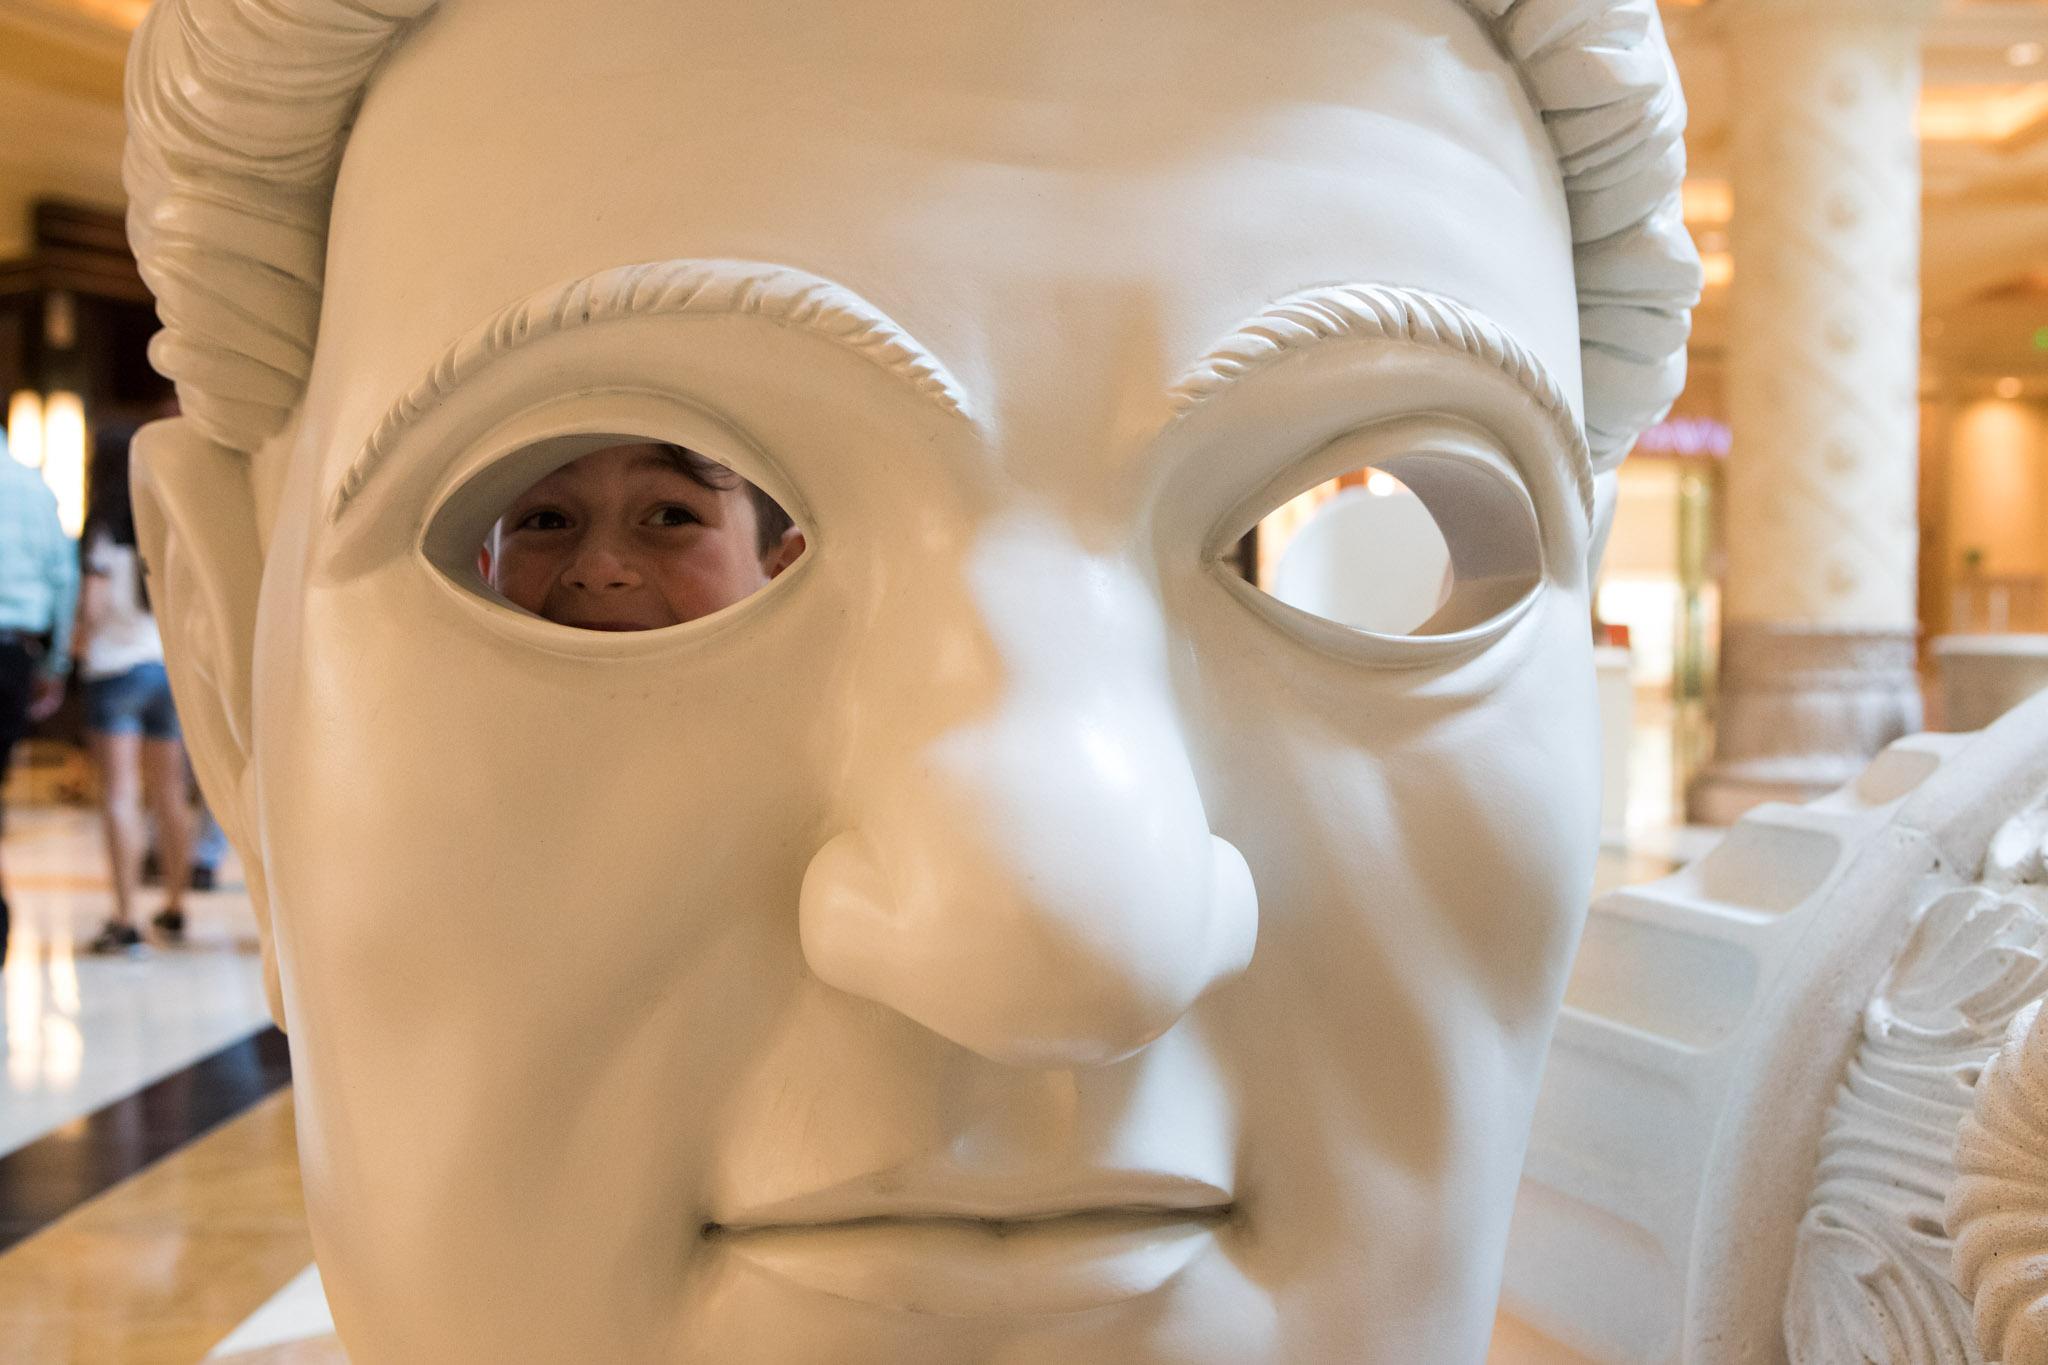 little boy peaking out eye socket of a large face statue.jpg